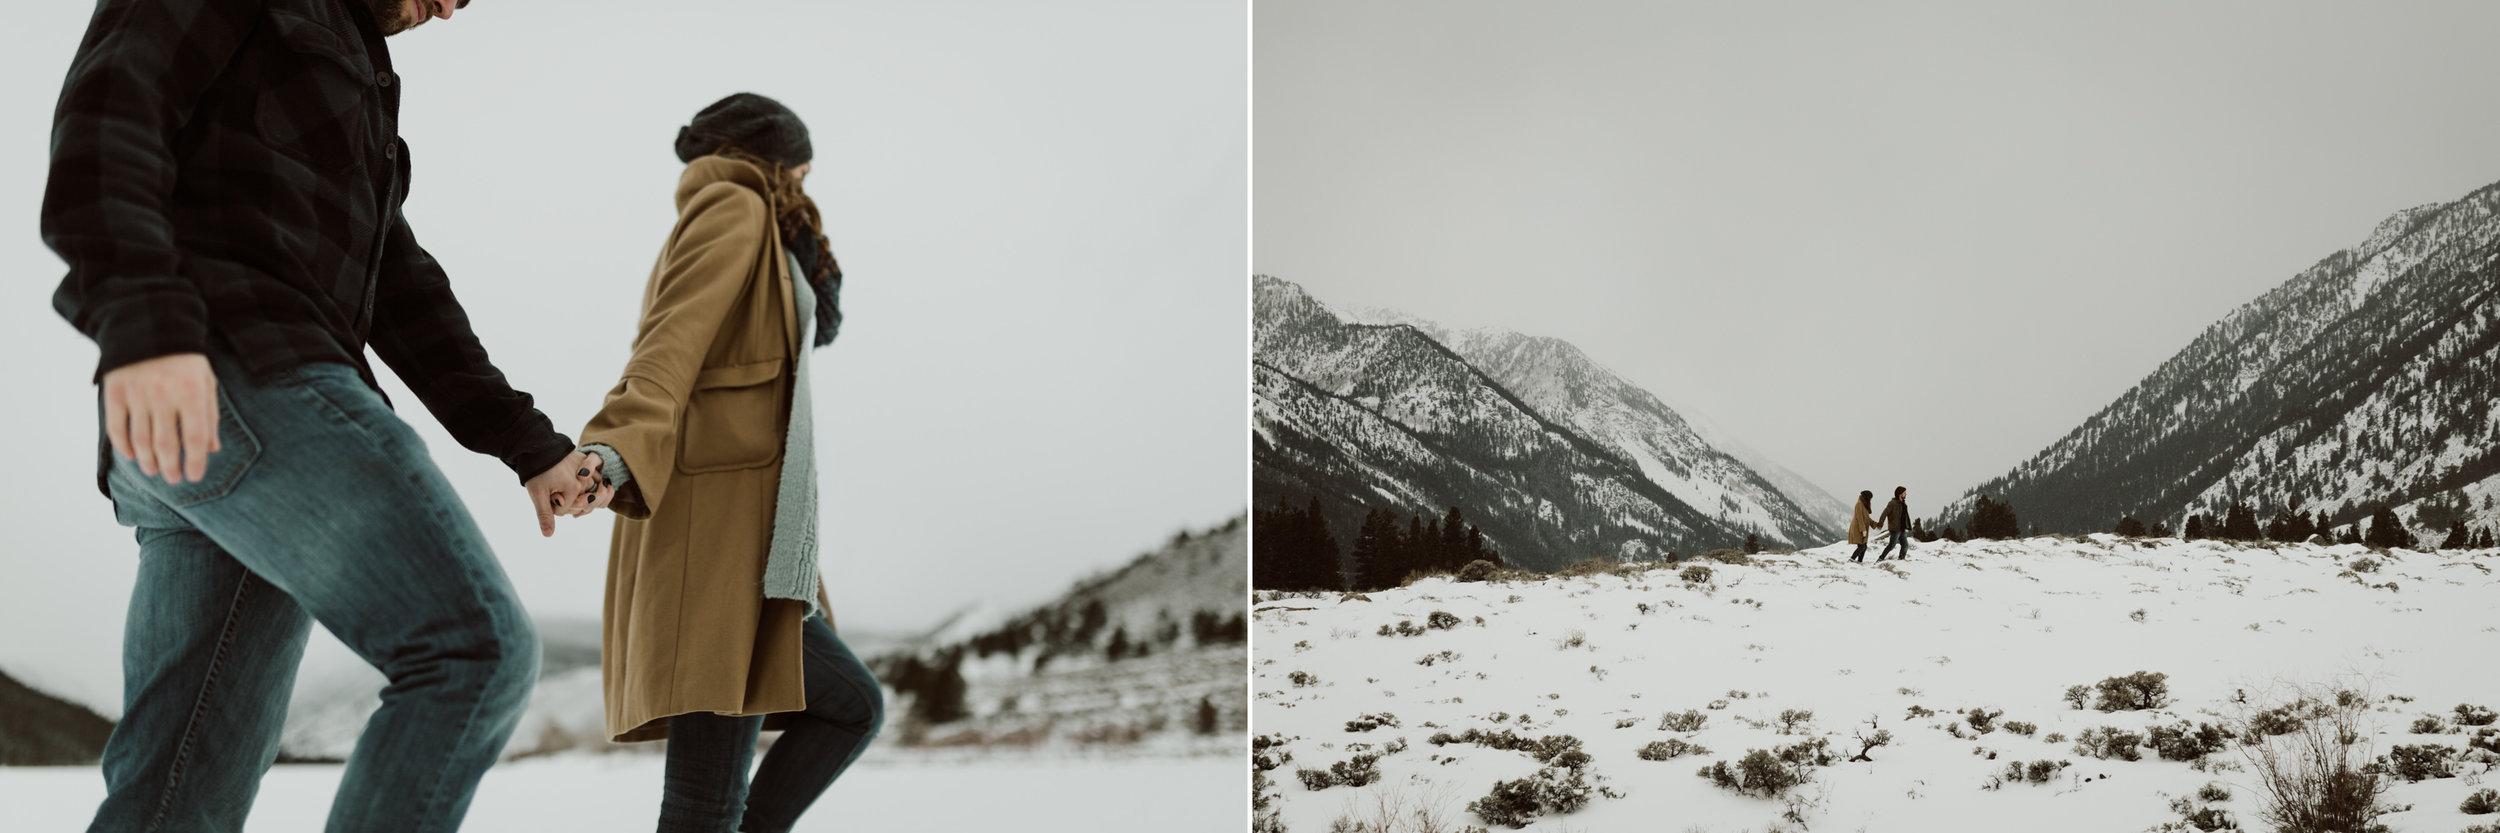 17-1-adventure-wedding-photographer-10.jpg